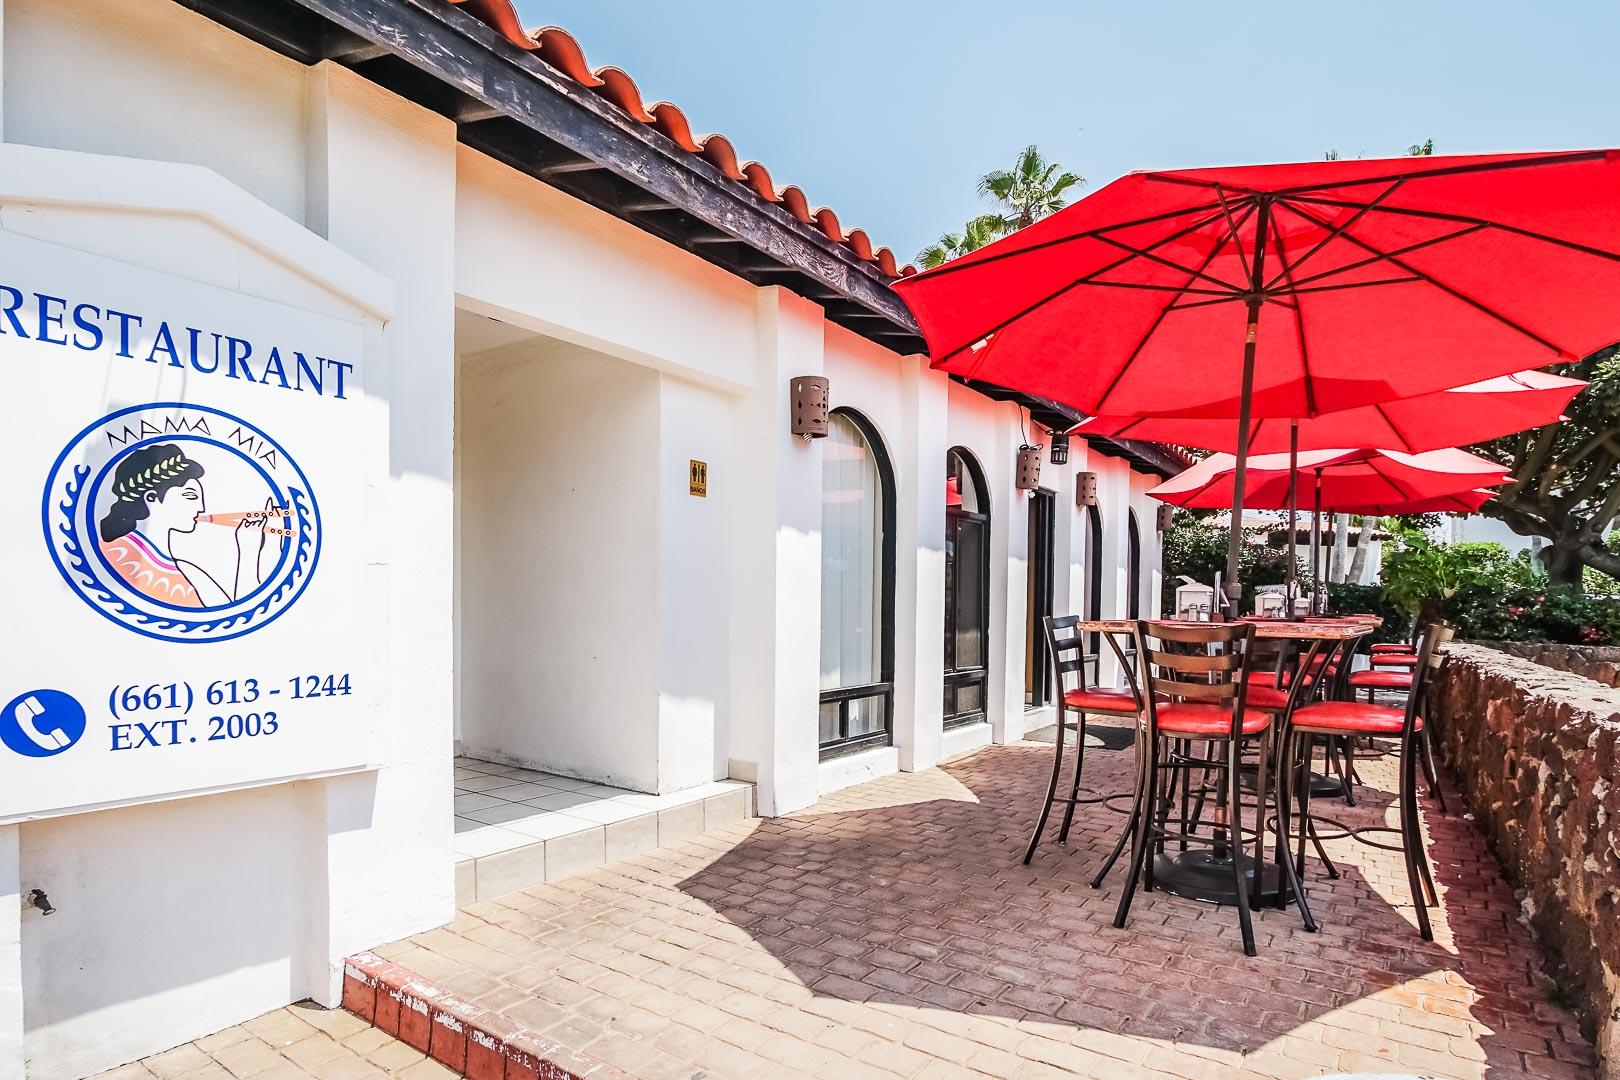 La Paloma - Restaurant Entrance